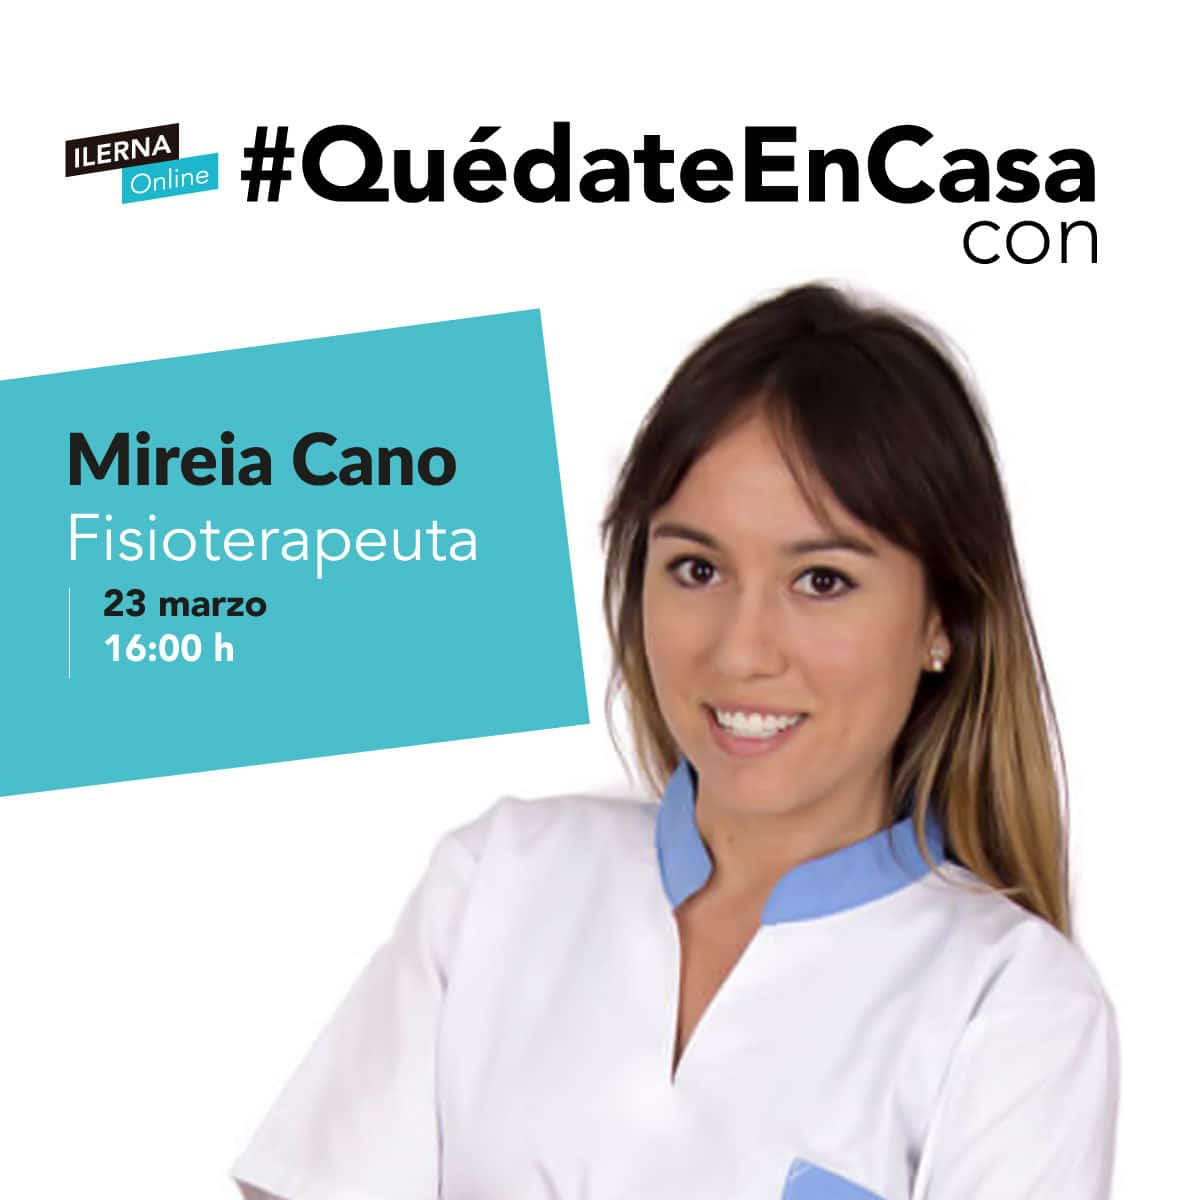 Mireia Cano, fisioterapeuta